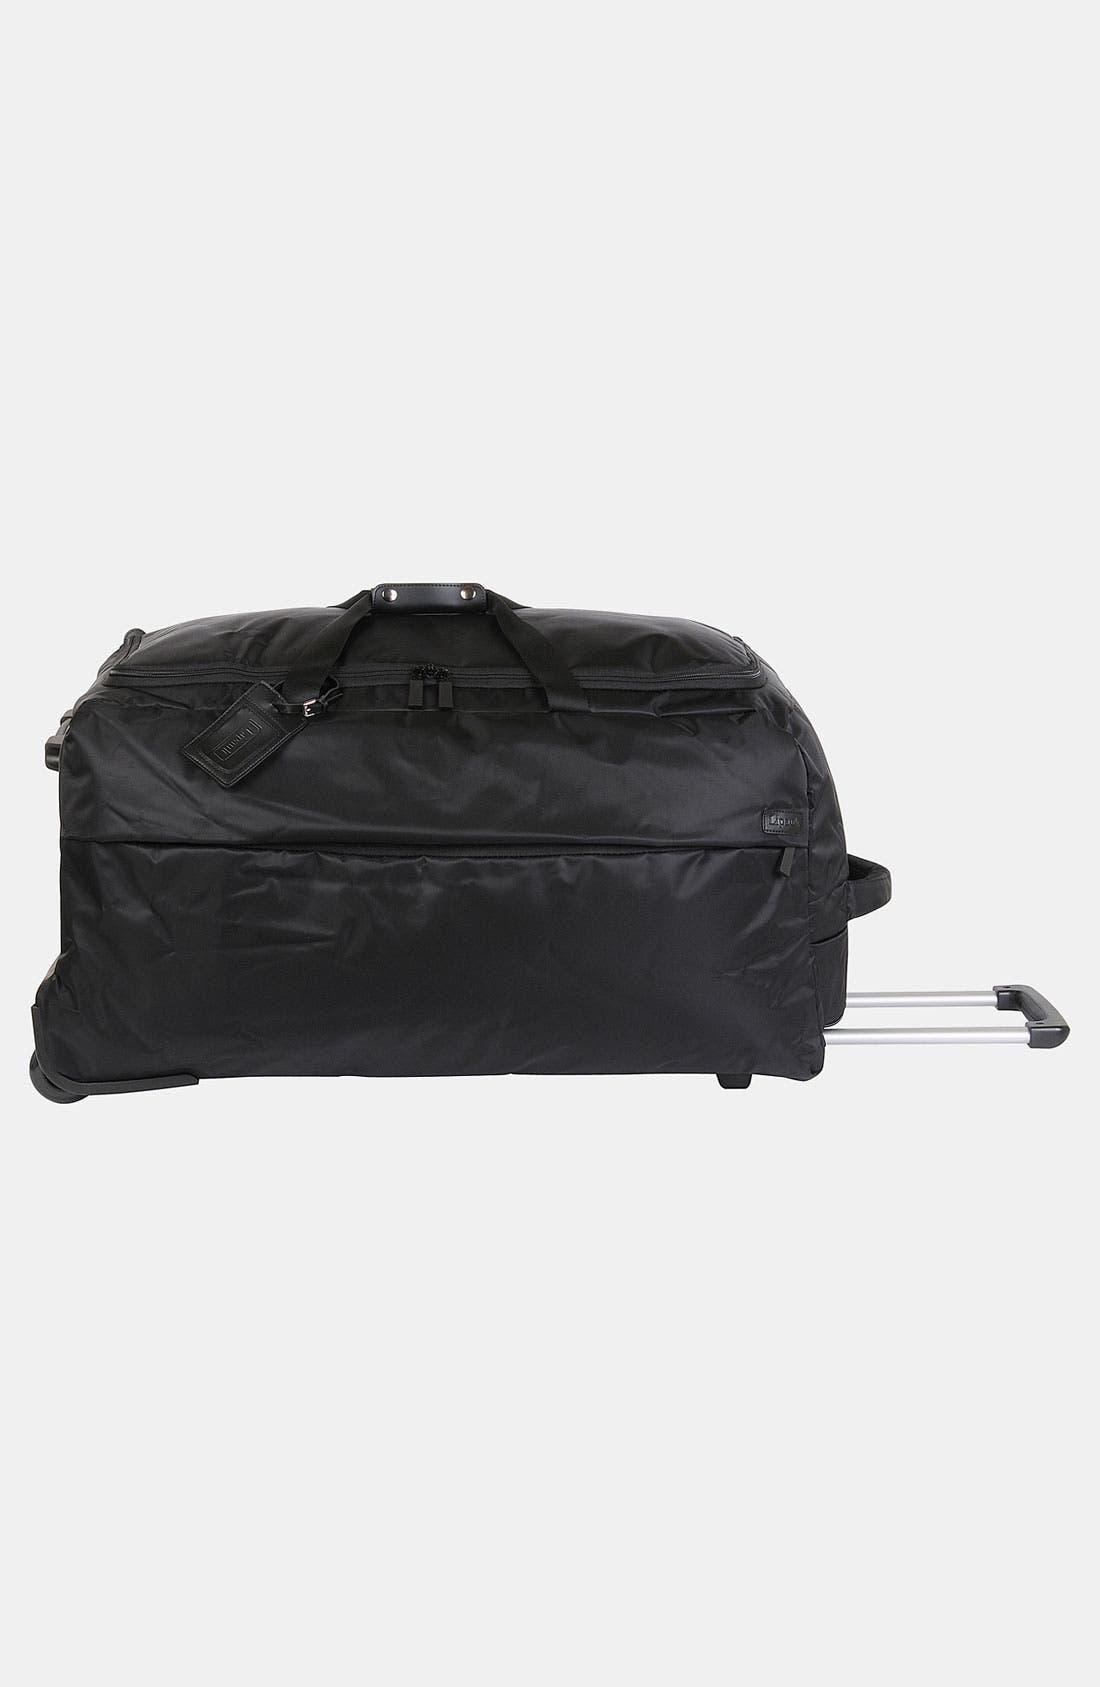 Foldable Rolling Duffel Bag,                             Alternate thumbnail 3, color,                             001